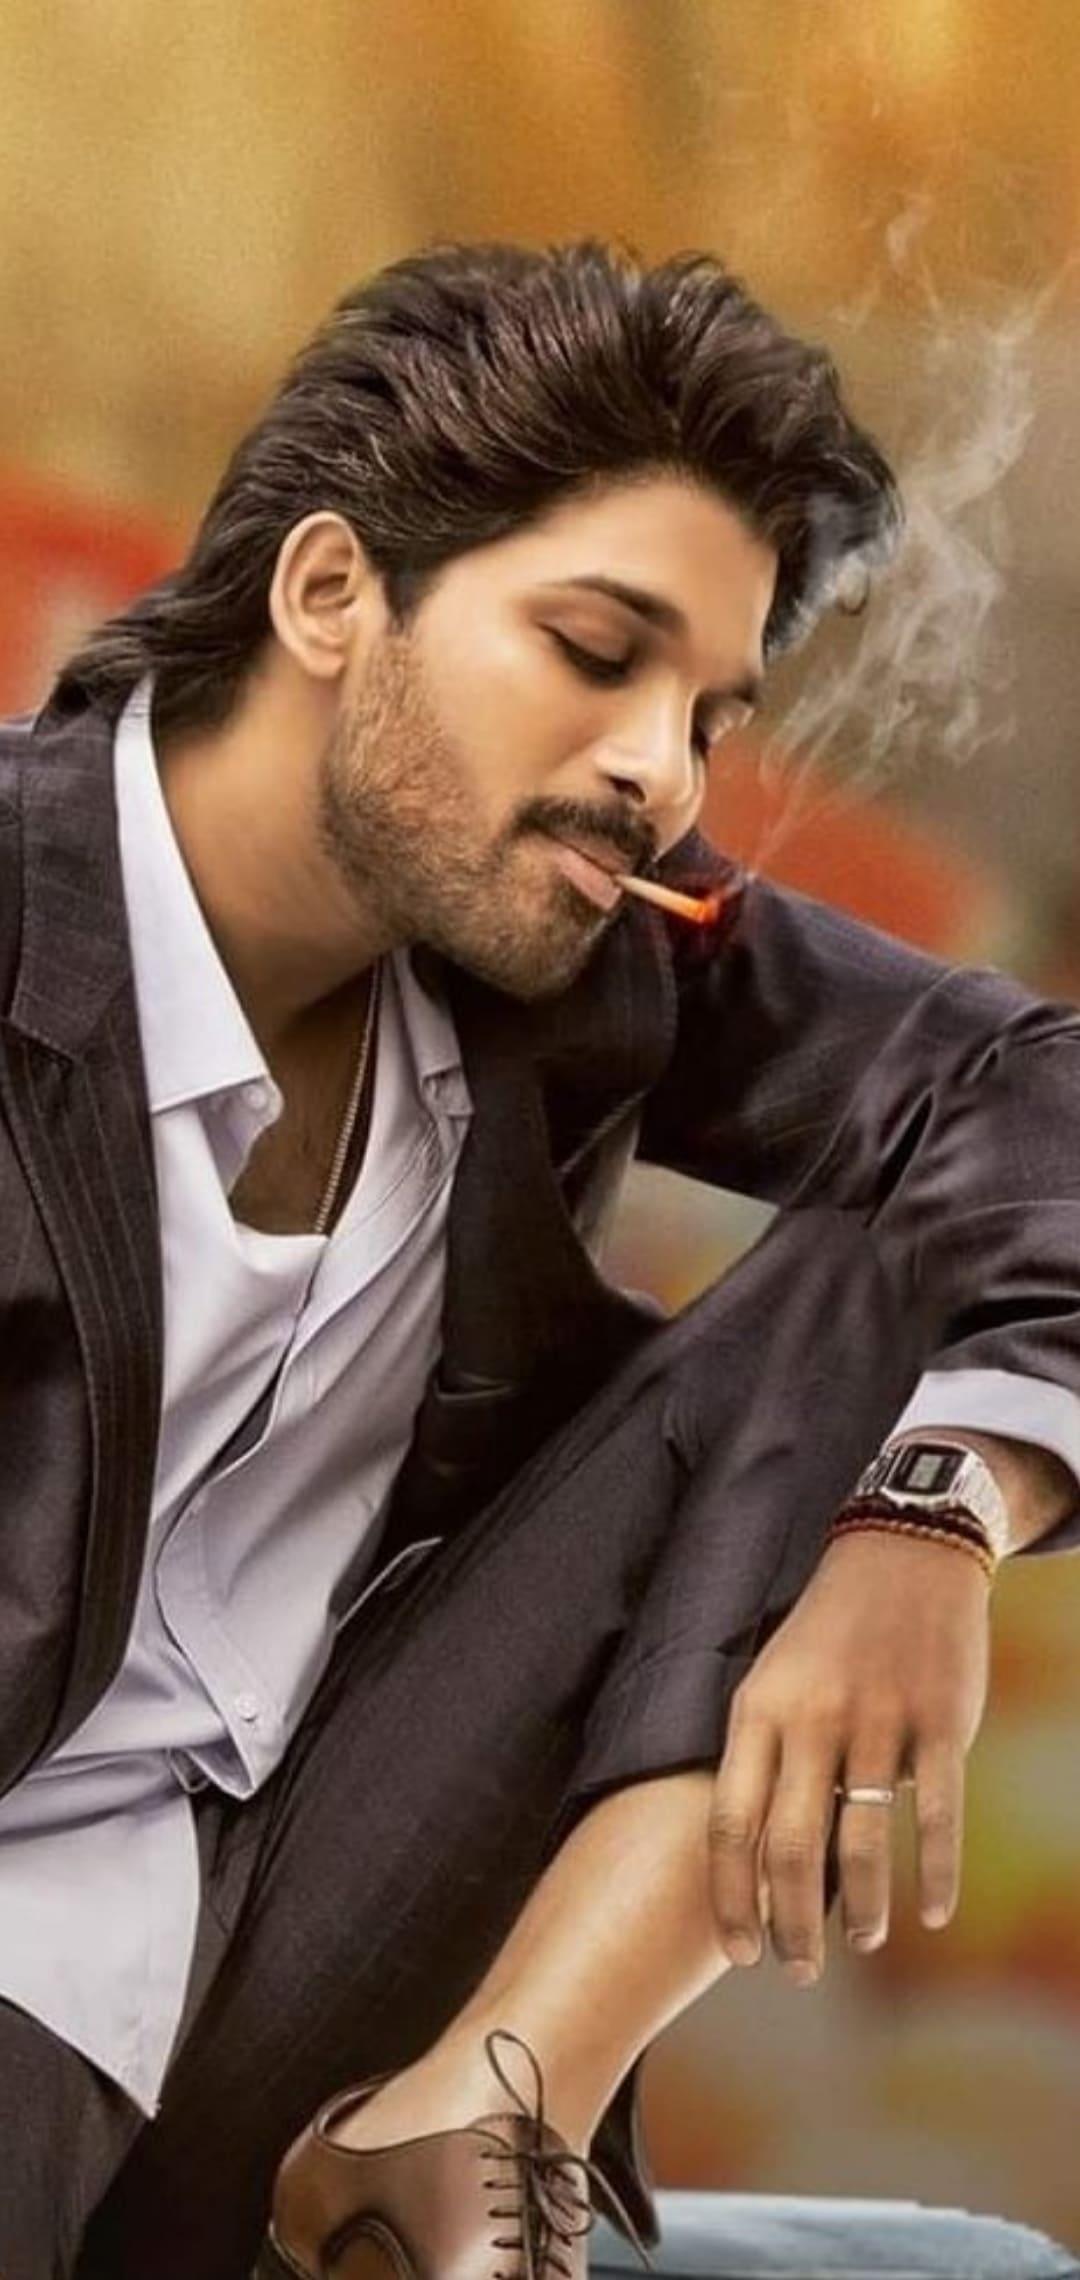 Allu Arjun Wallpapers   Top 15 Best Allu Arjun Backgrounds Download